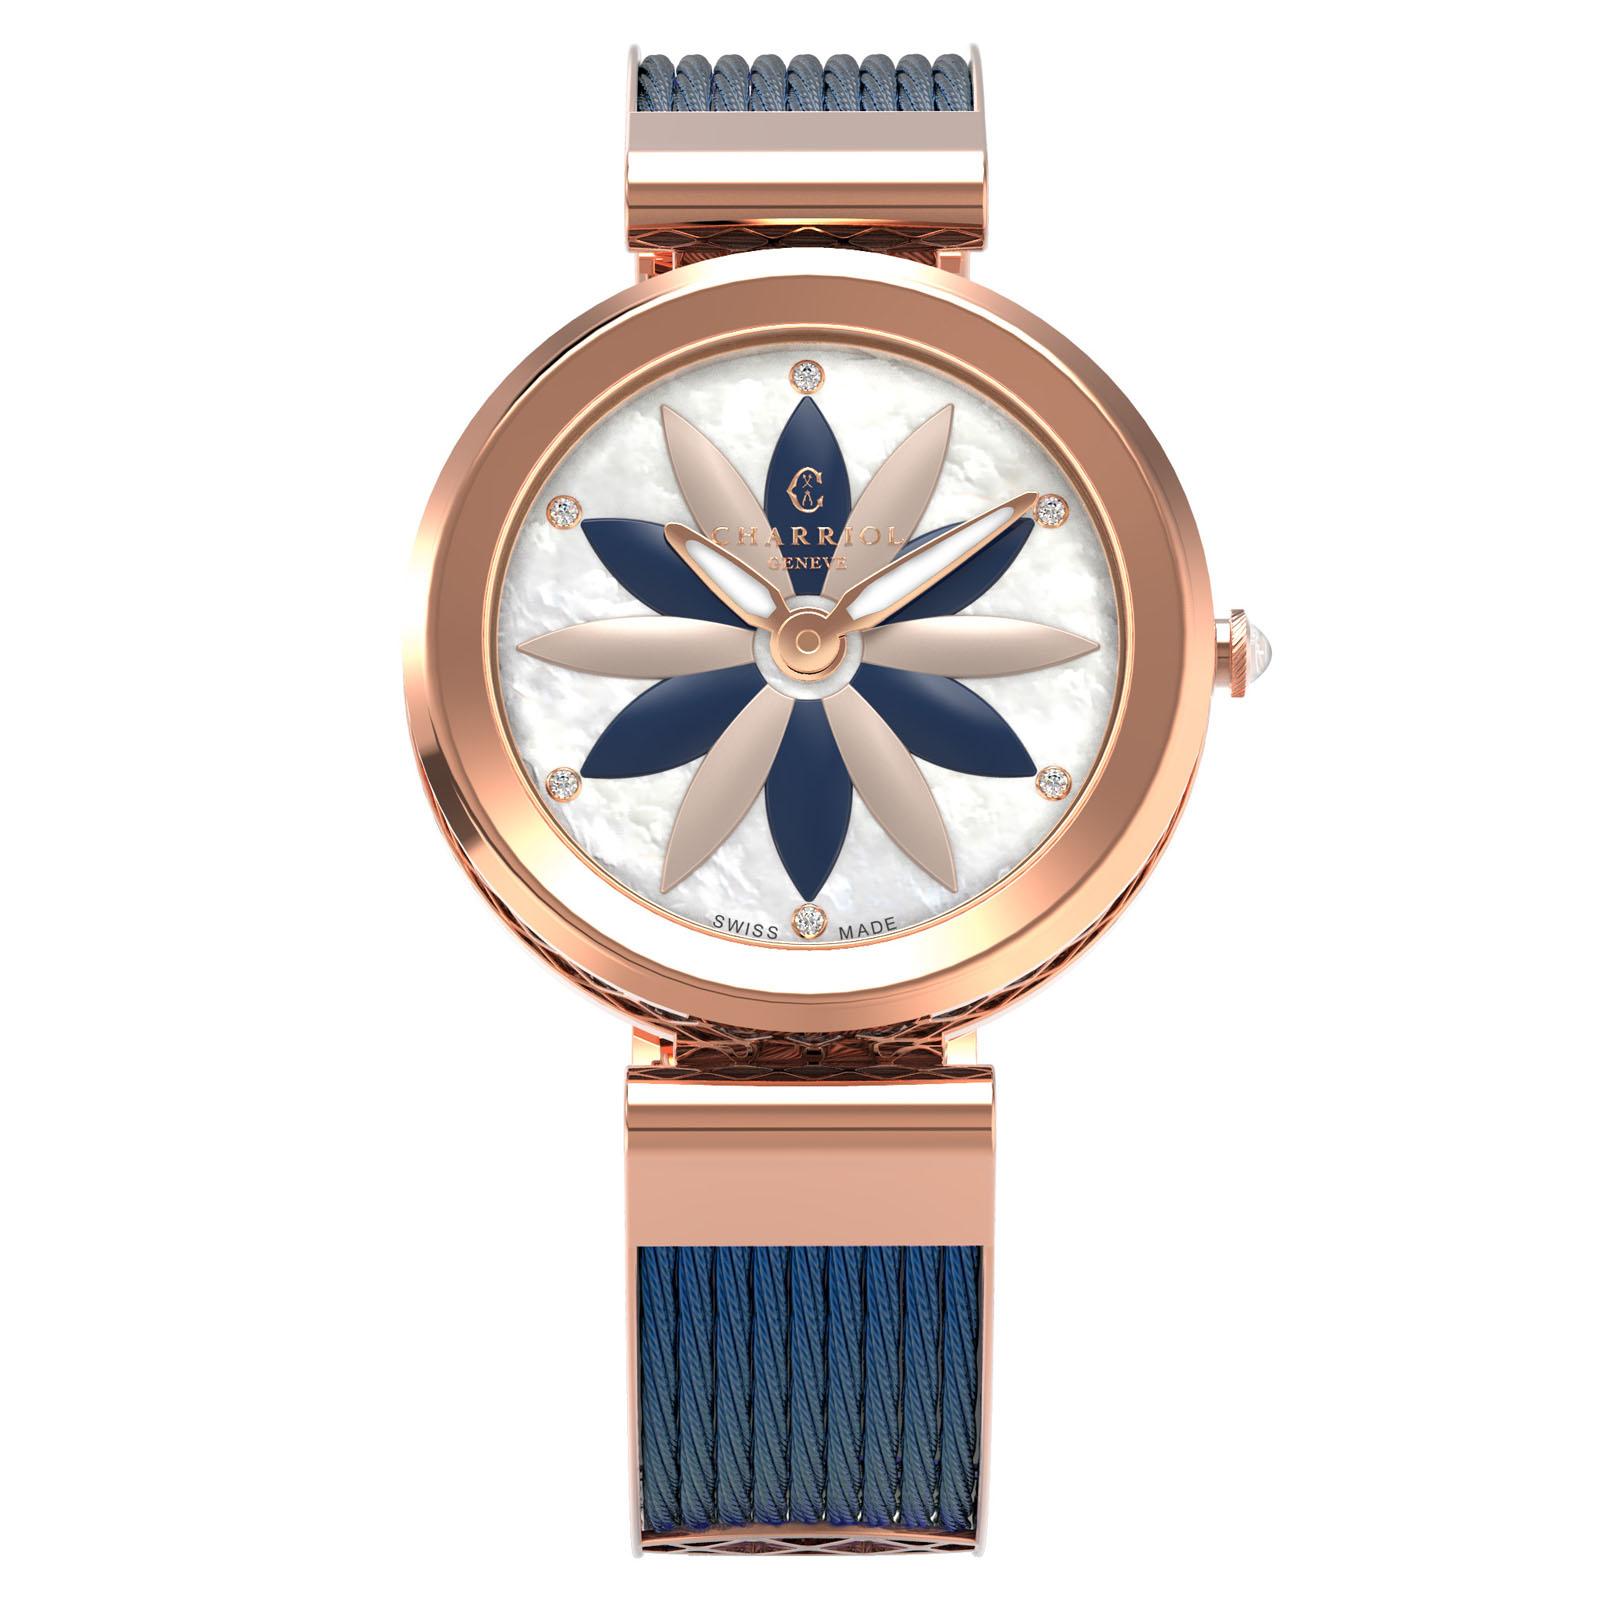 CHARRIOL夏利豪(FE32.F02.0F2)Forever系列半鋼索花朵時尚腕錶/珍珠母貝面32mm